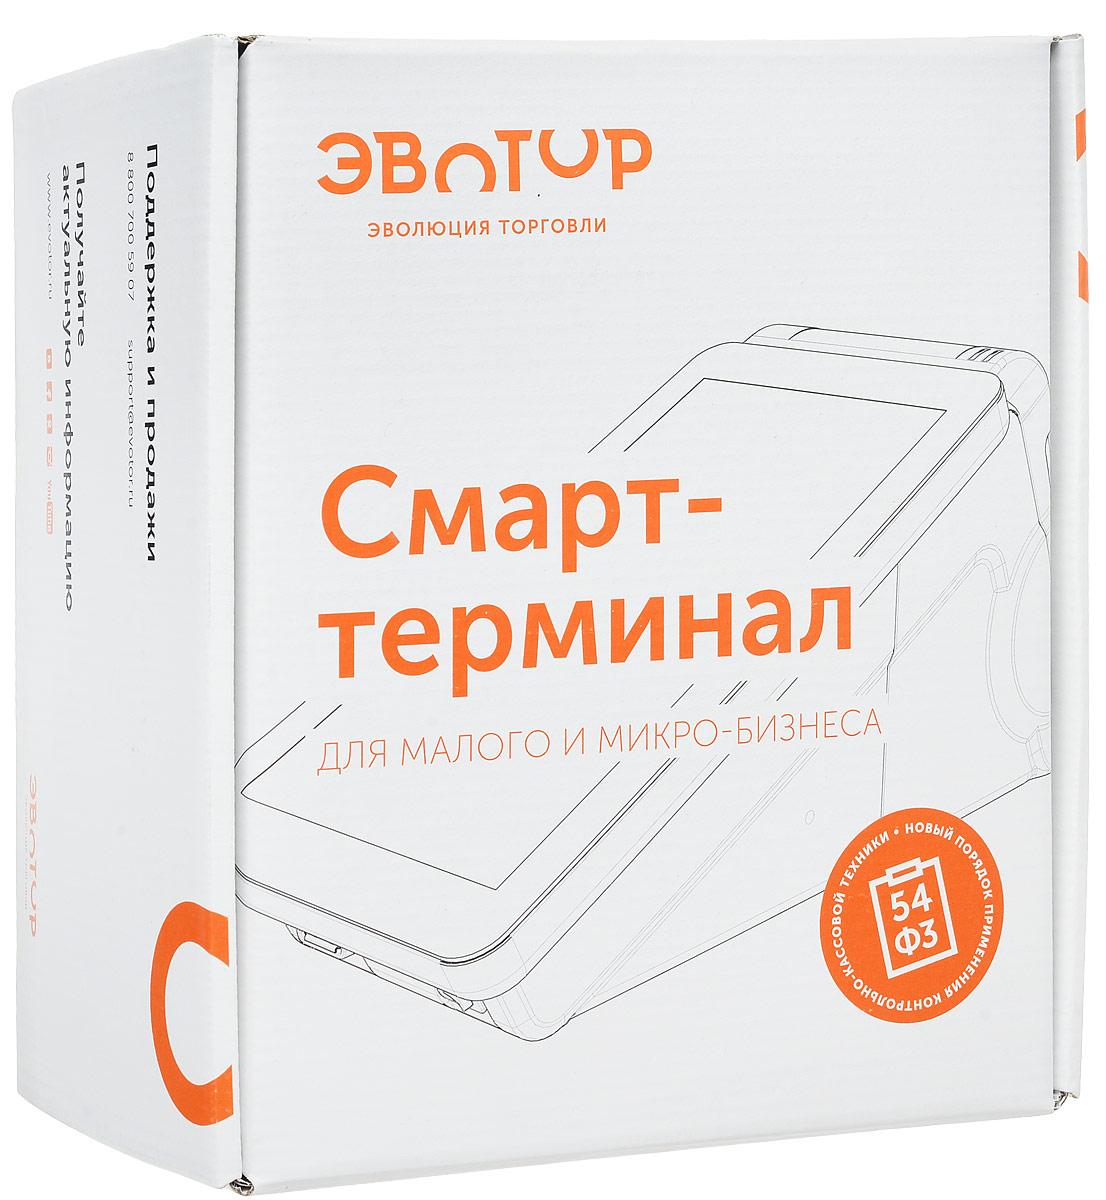 Эвотор ФН смарт-терминал